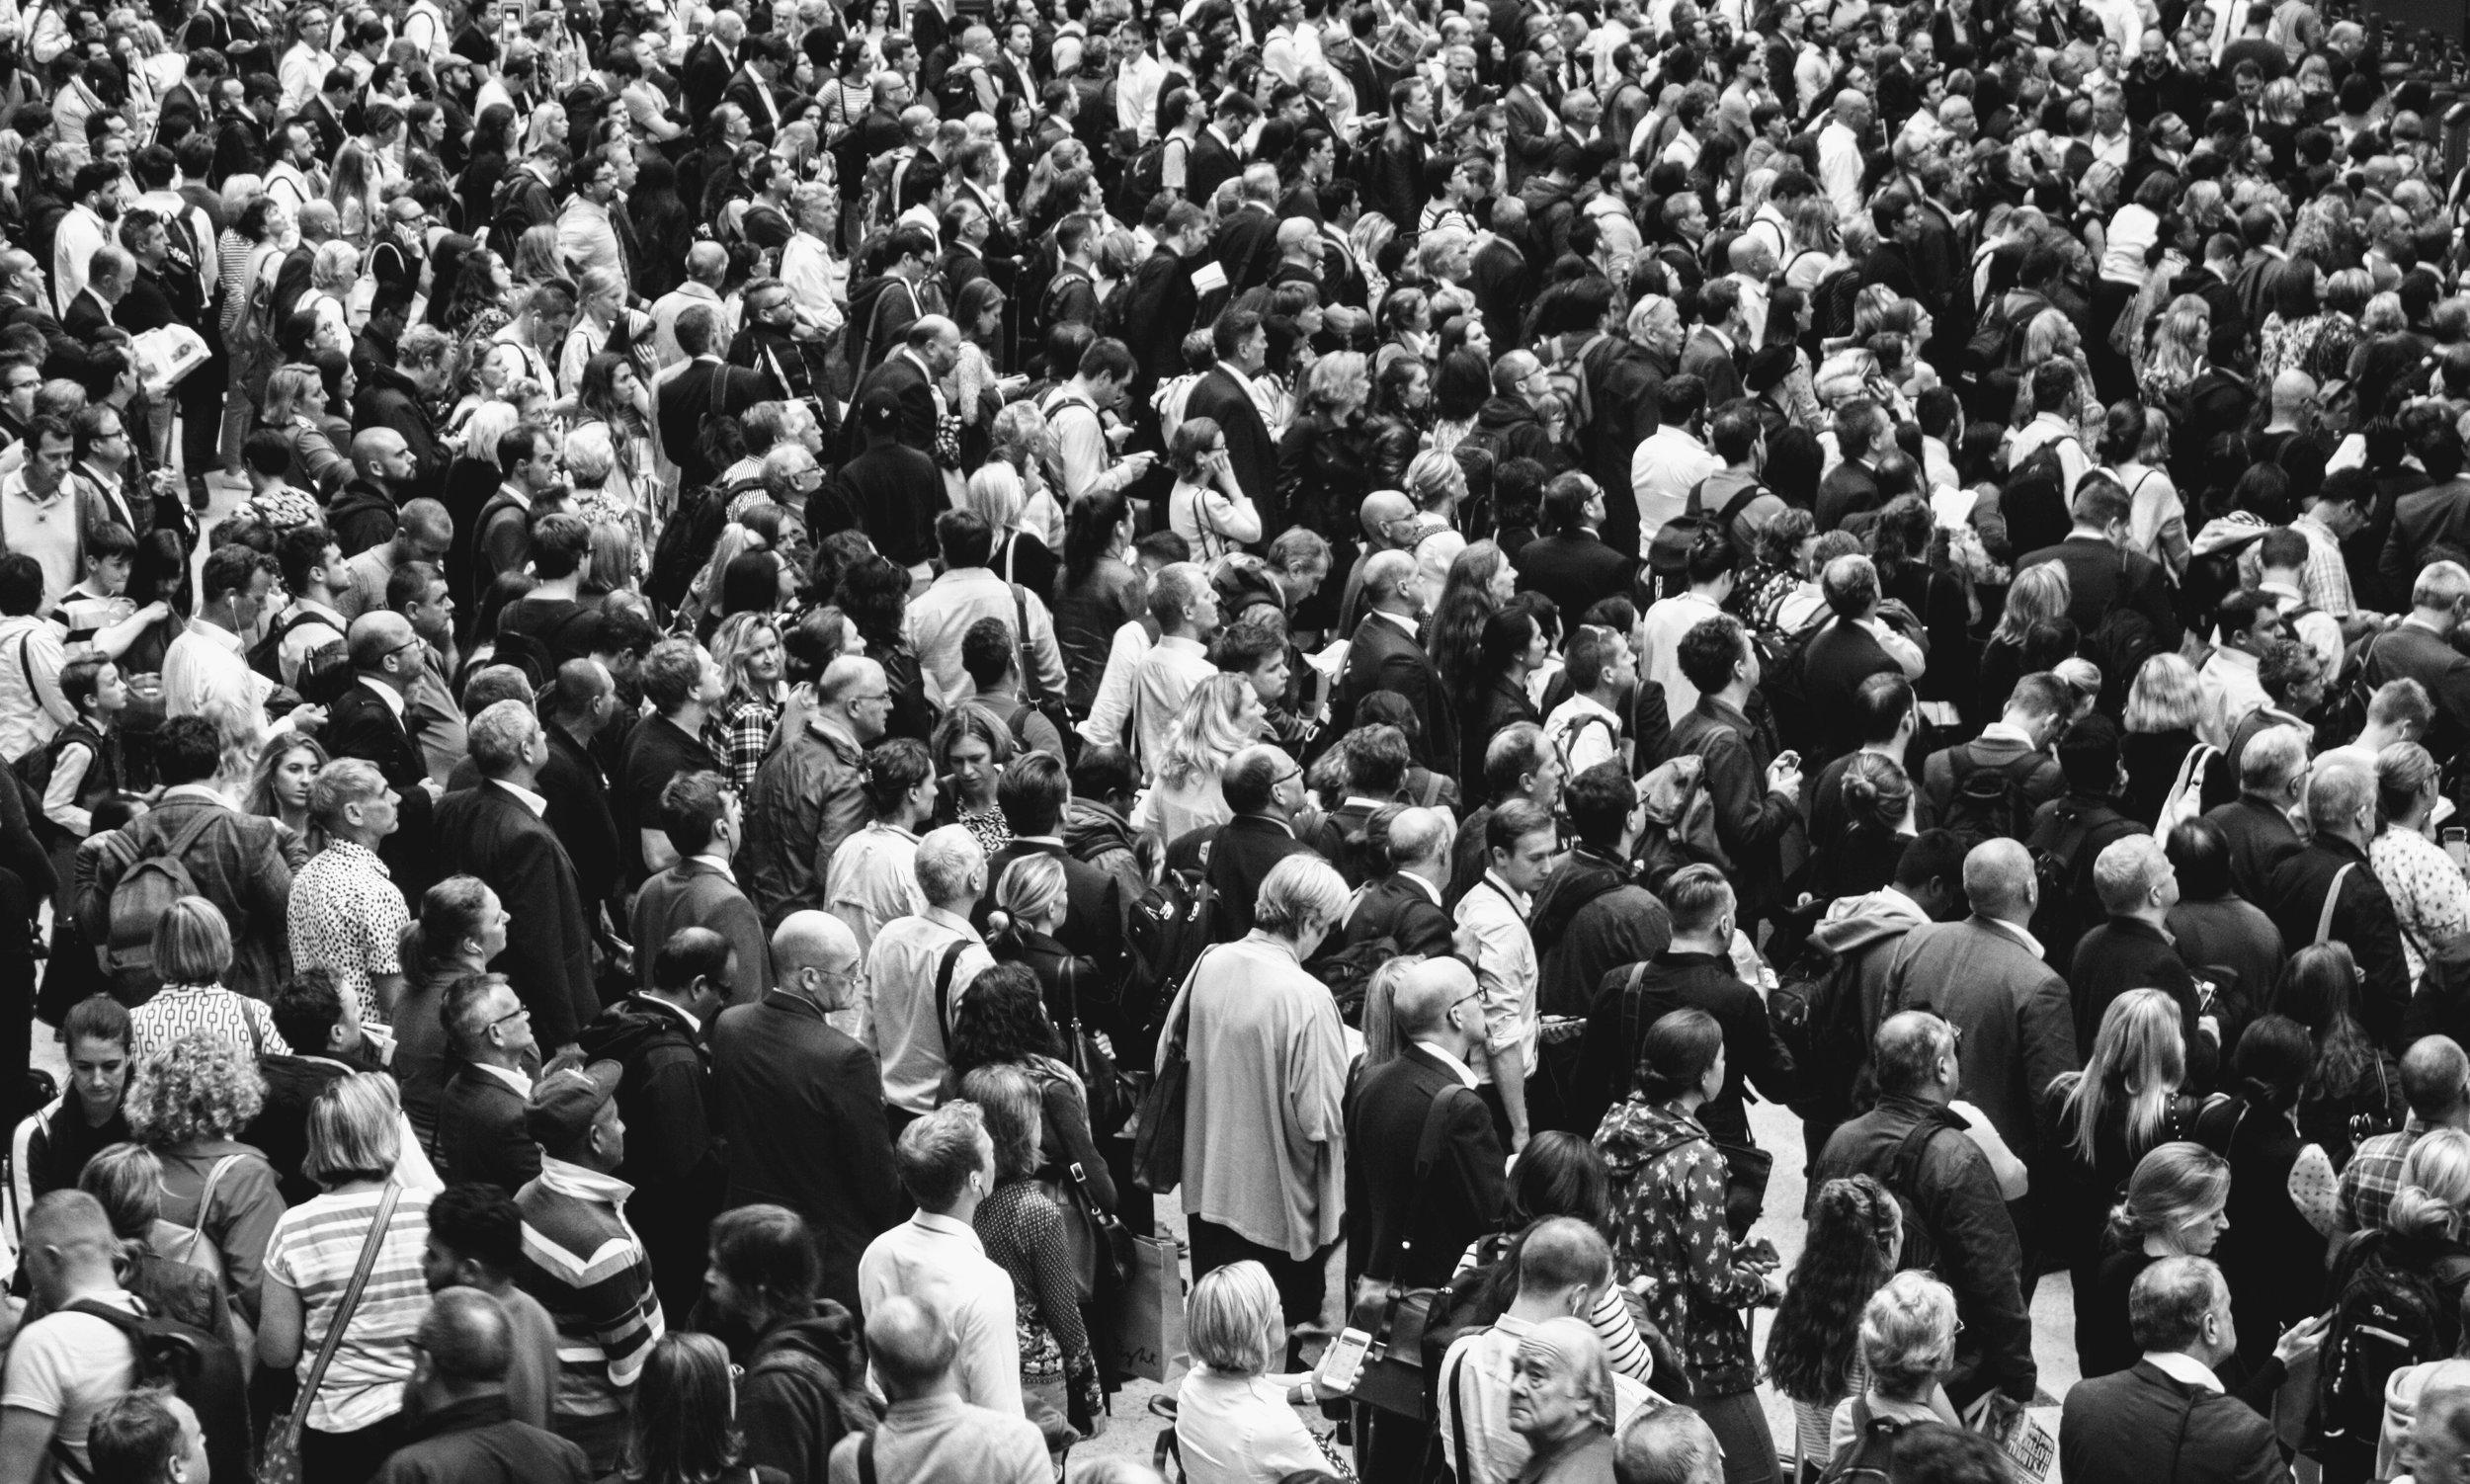 crowd_fomo.jpg